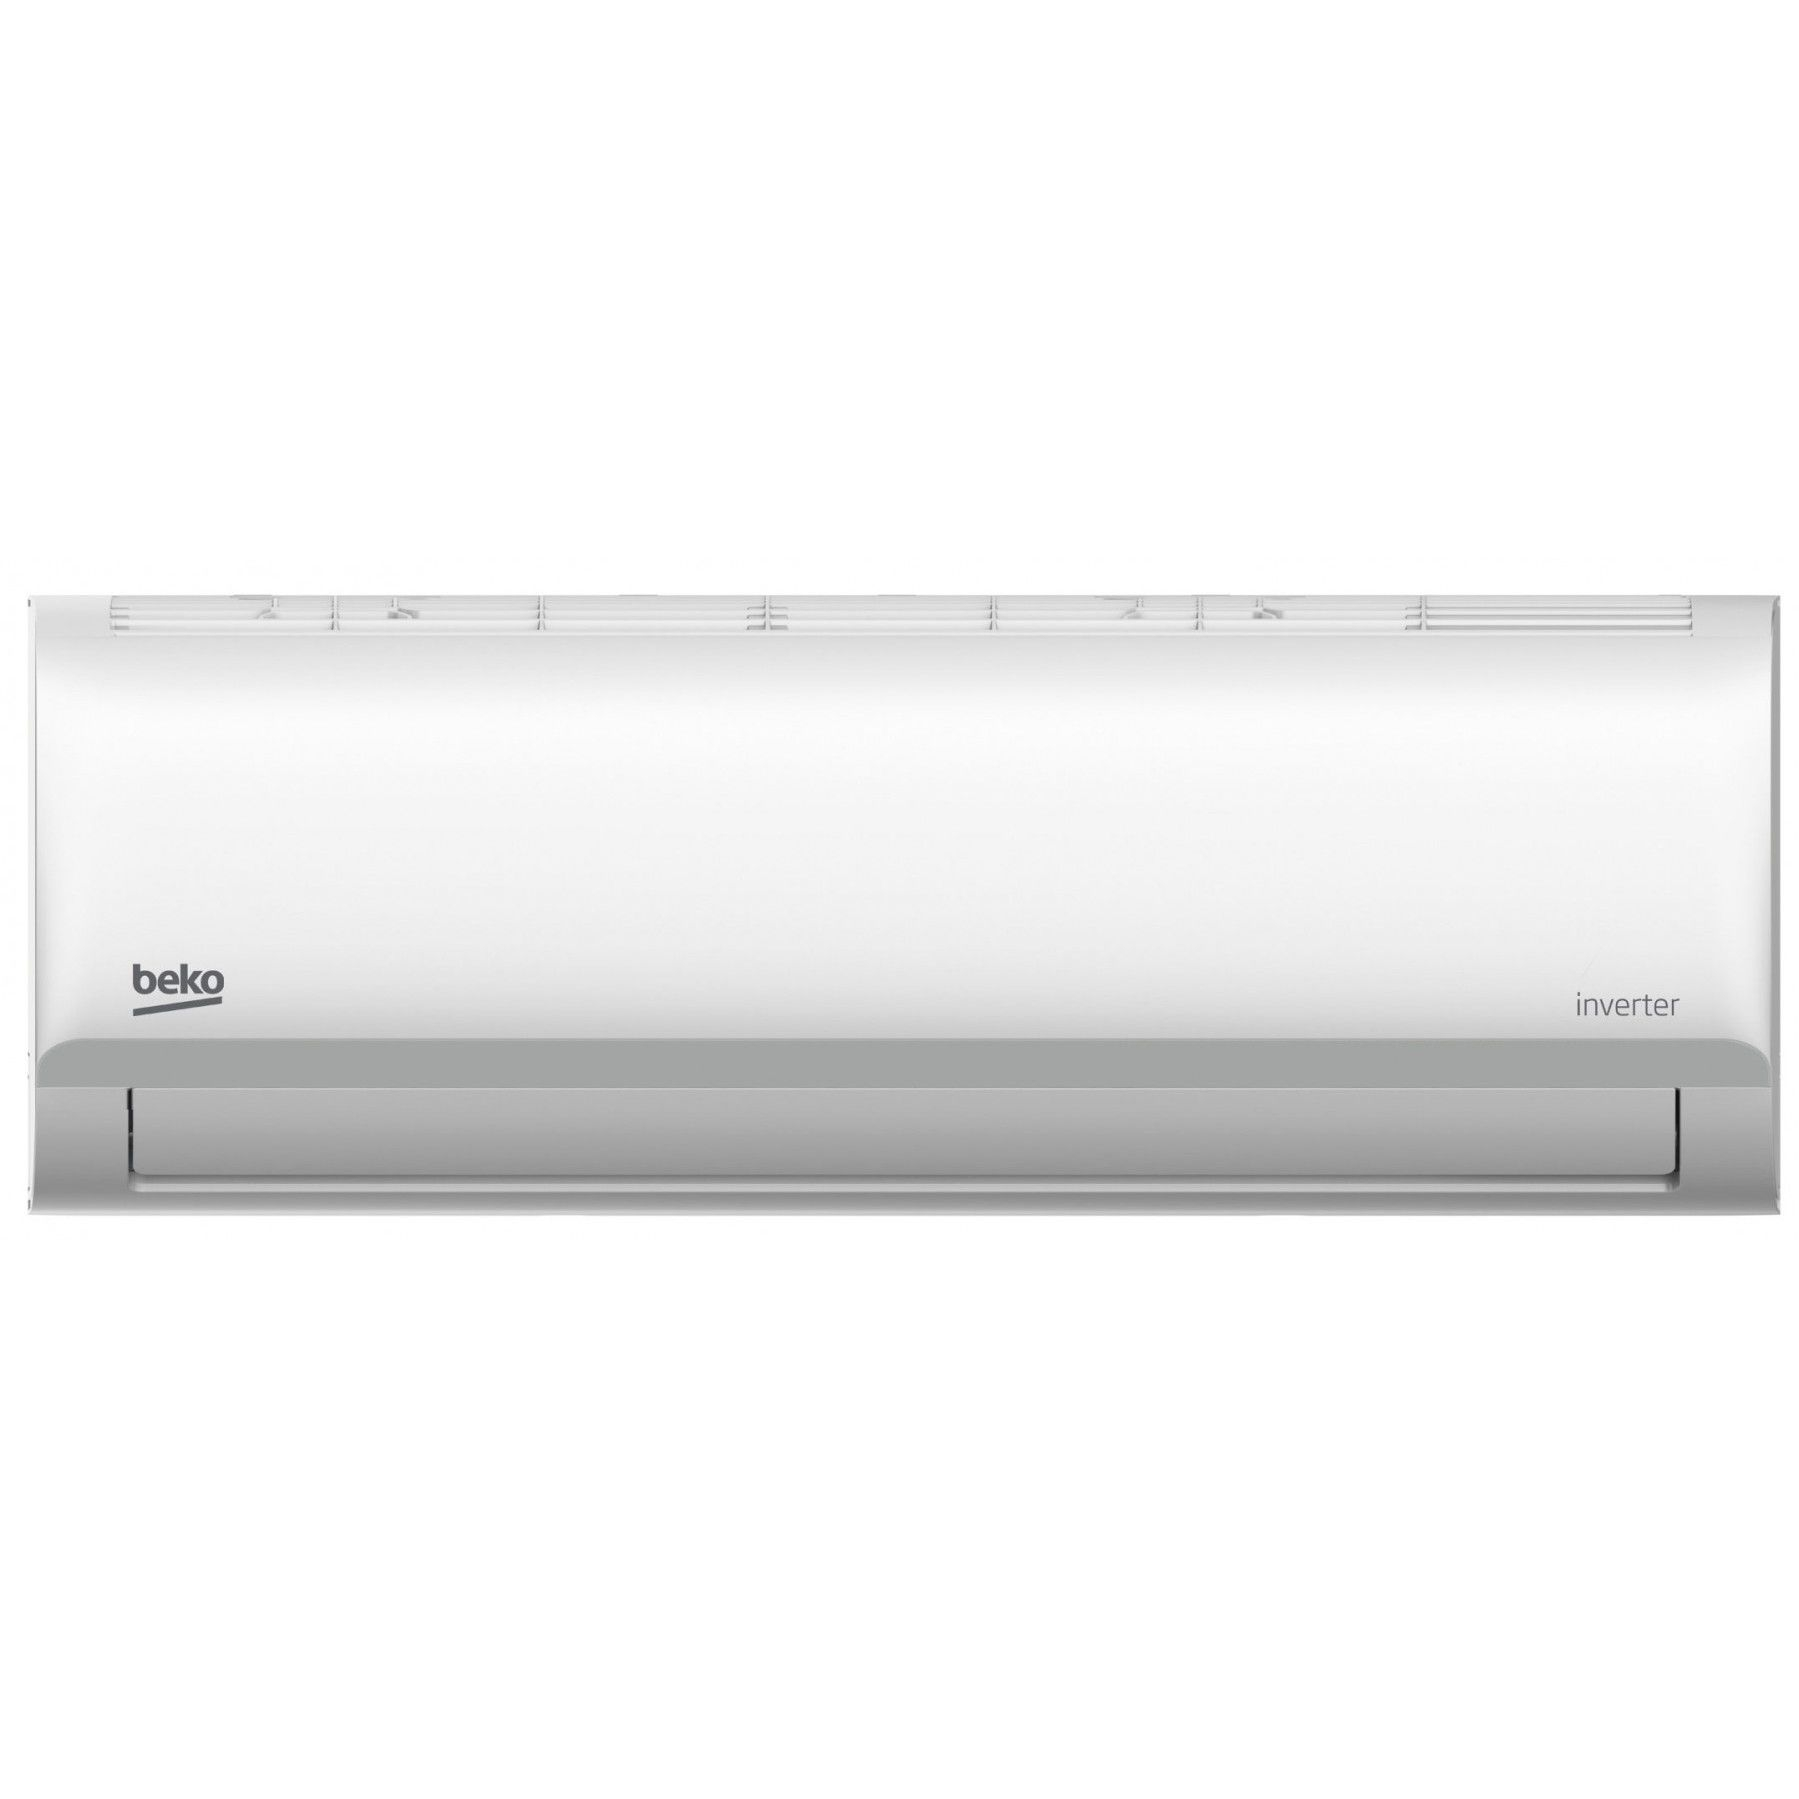 Aparat de aer conditionat BEKO BRVPF 120 / BRVPF 121, A++/A+, 12.000BTU/h, kit instalare inclus